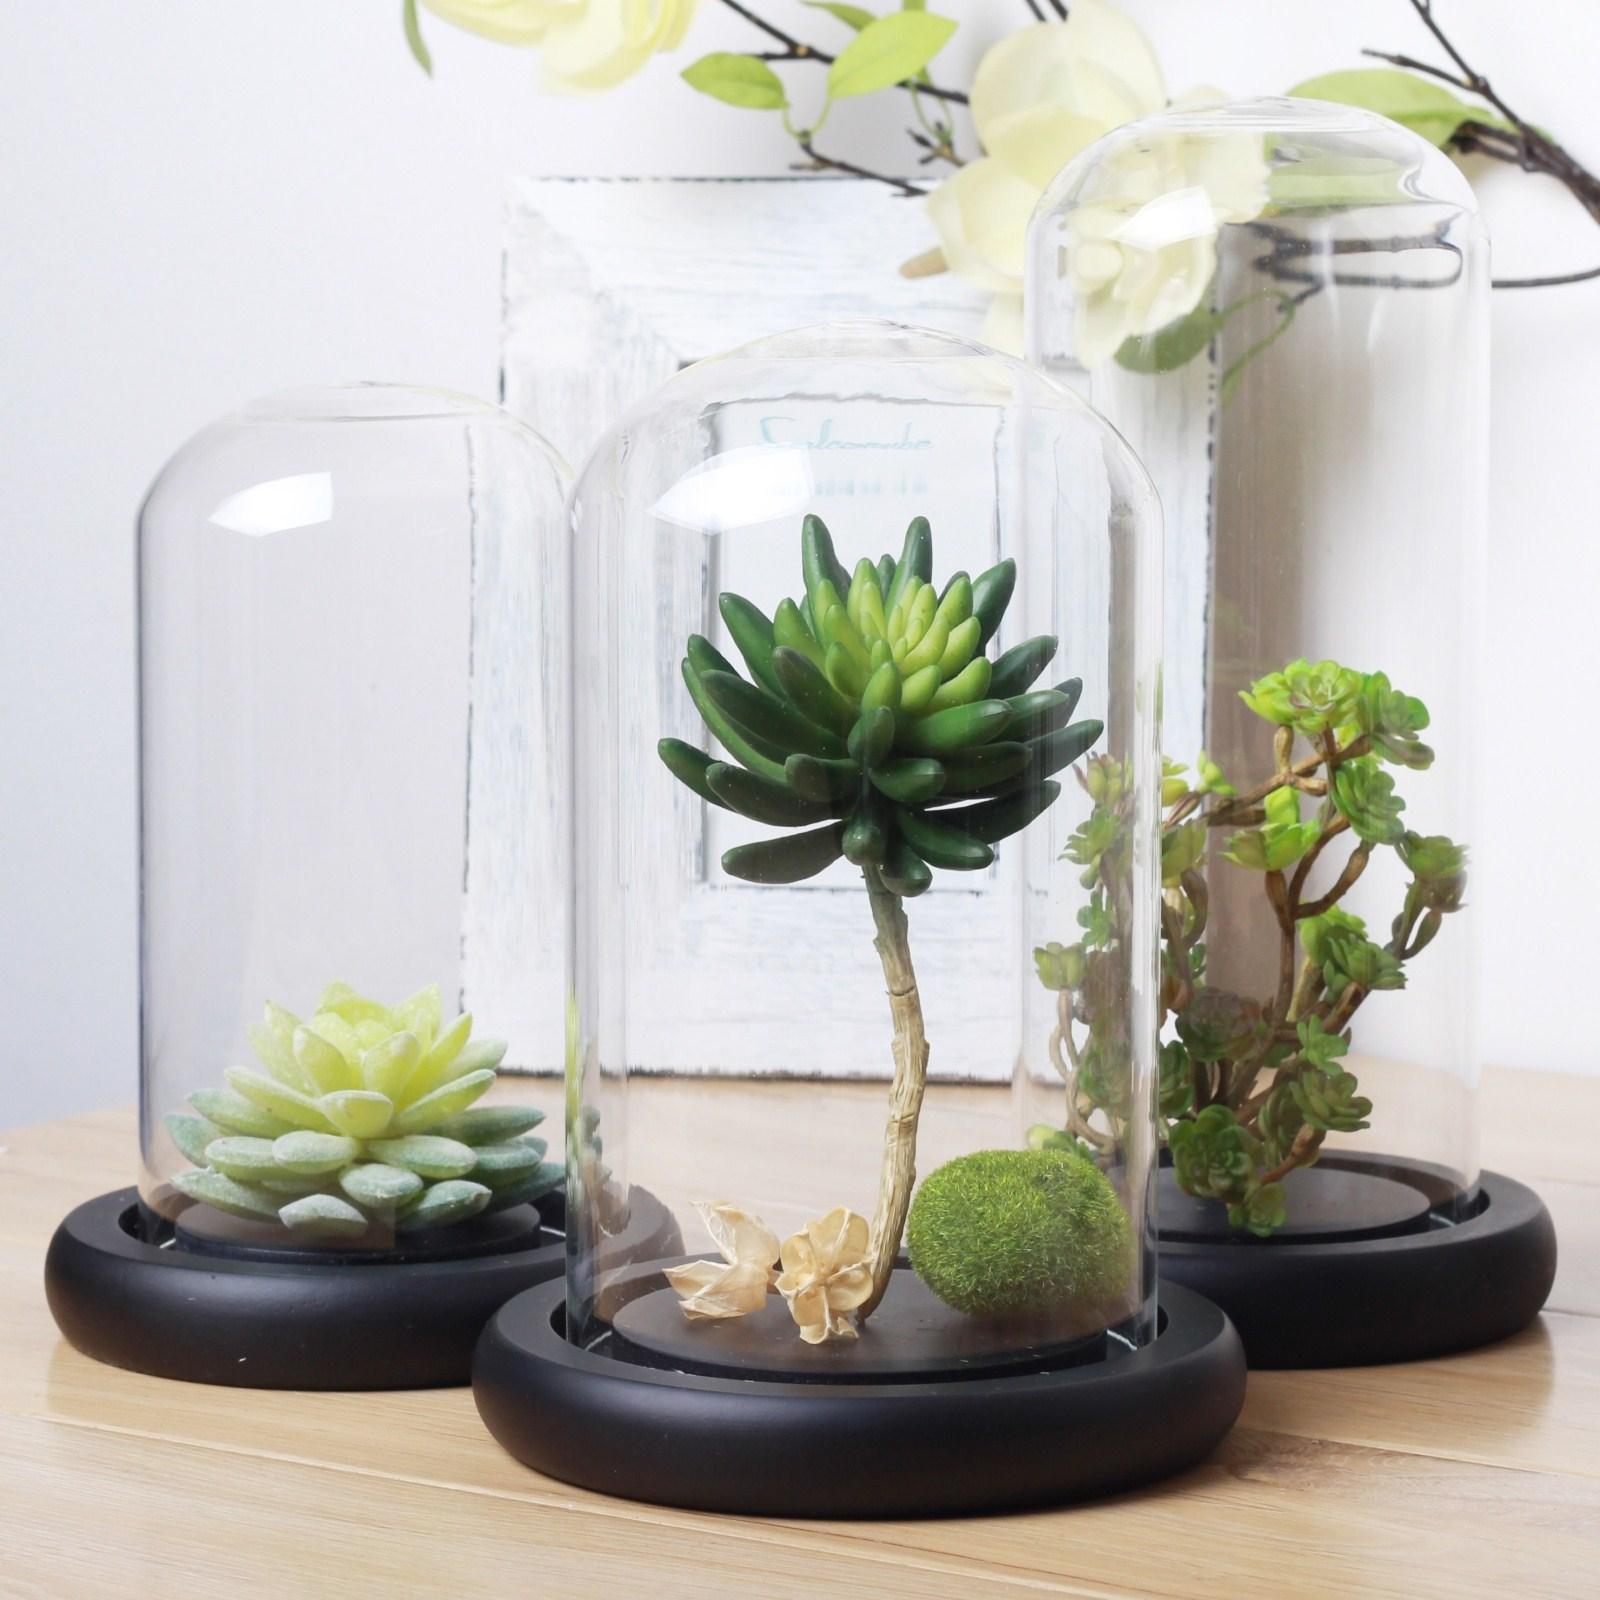 h j made bell jar glass cover without knob home decoration wedding decoration wholesale in vases. Black Bedroom Furniture Sets. Home Design Ideas